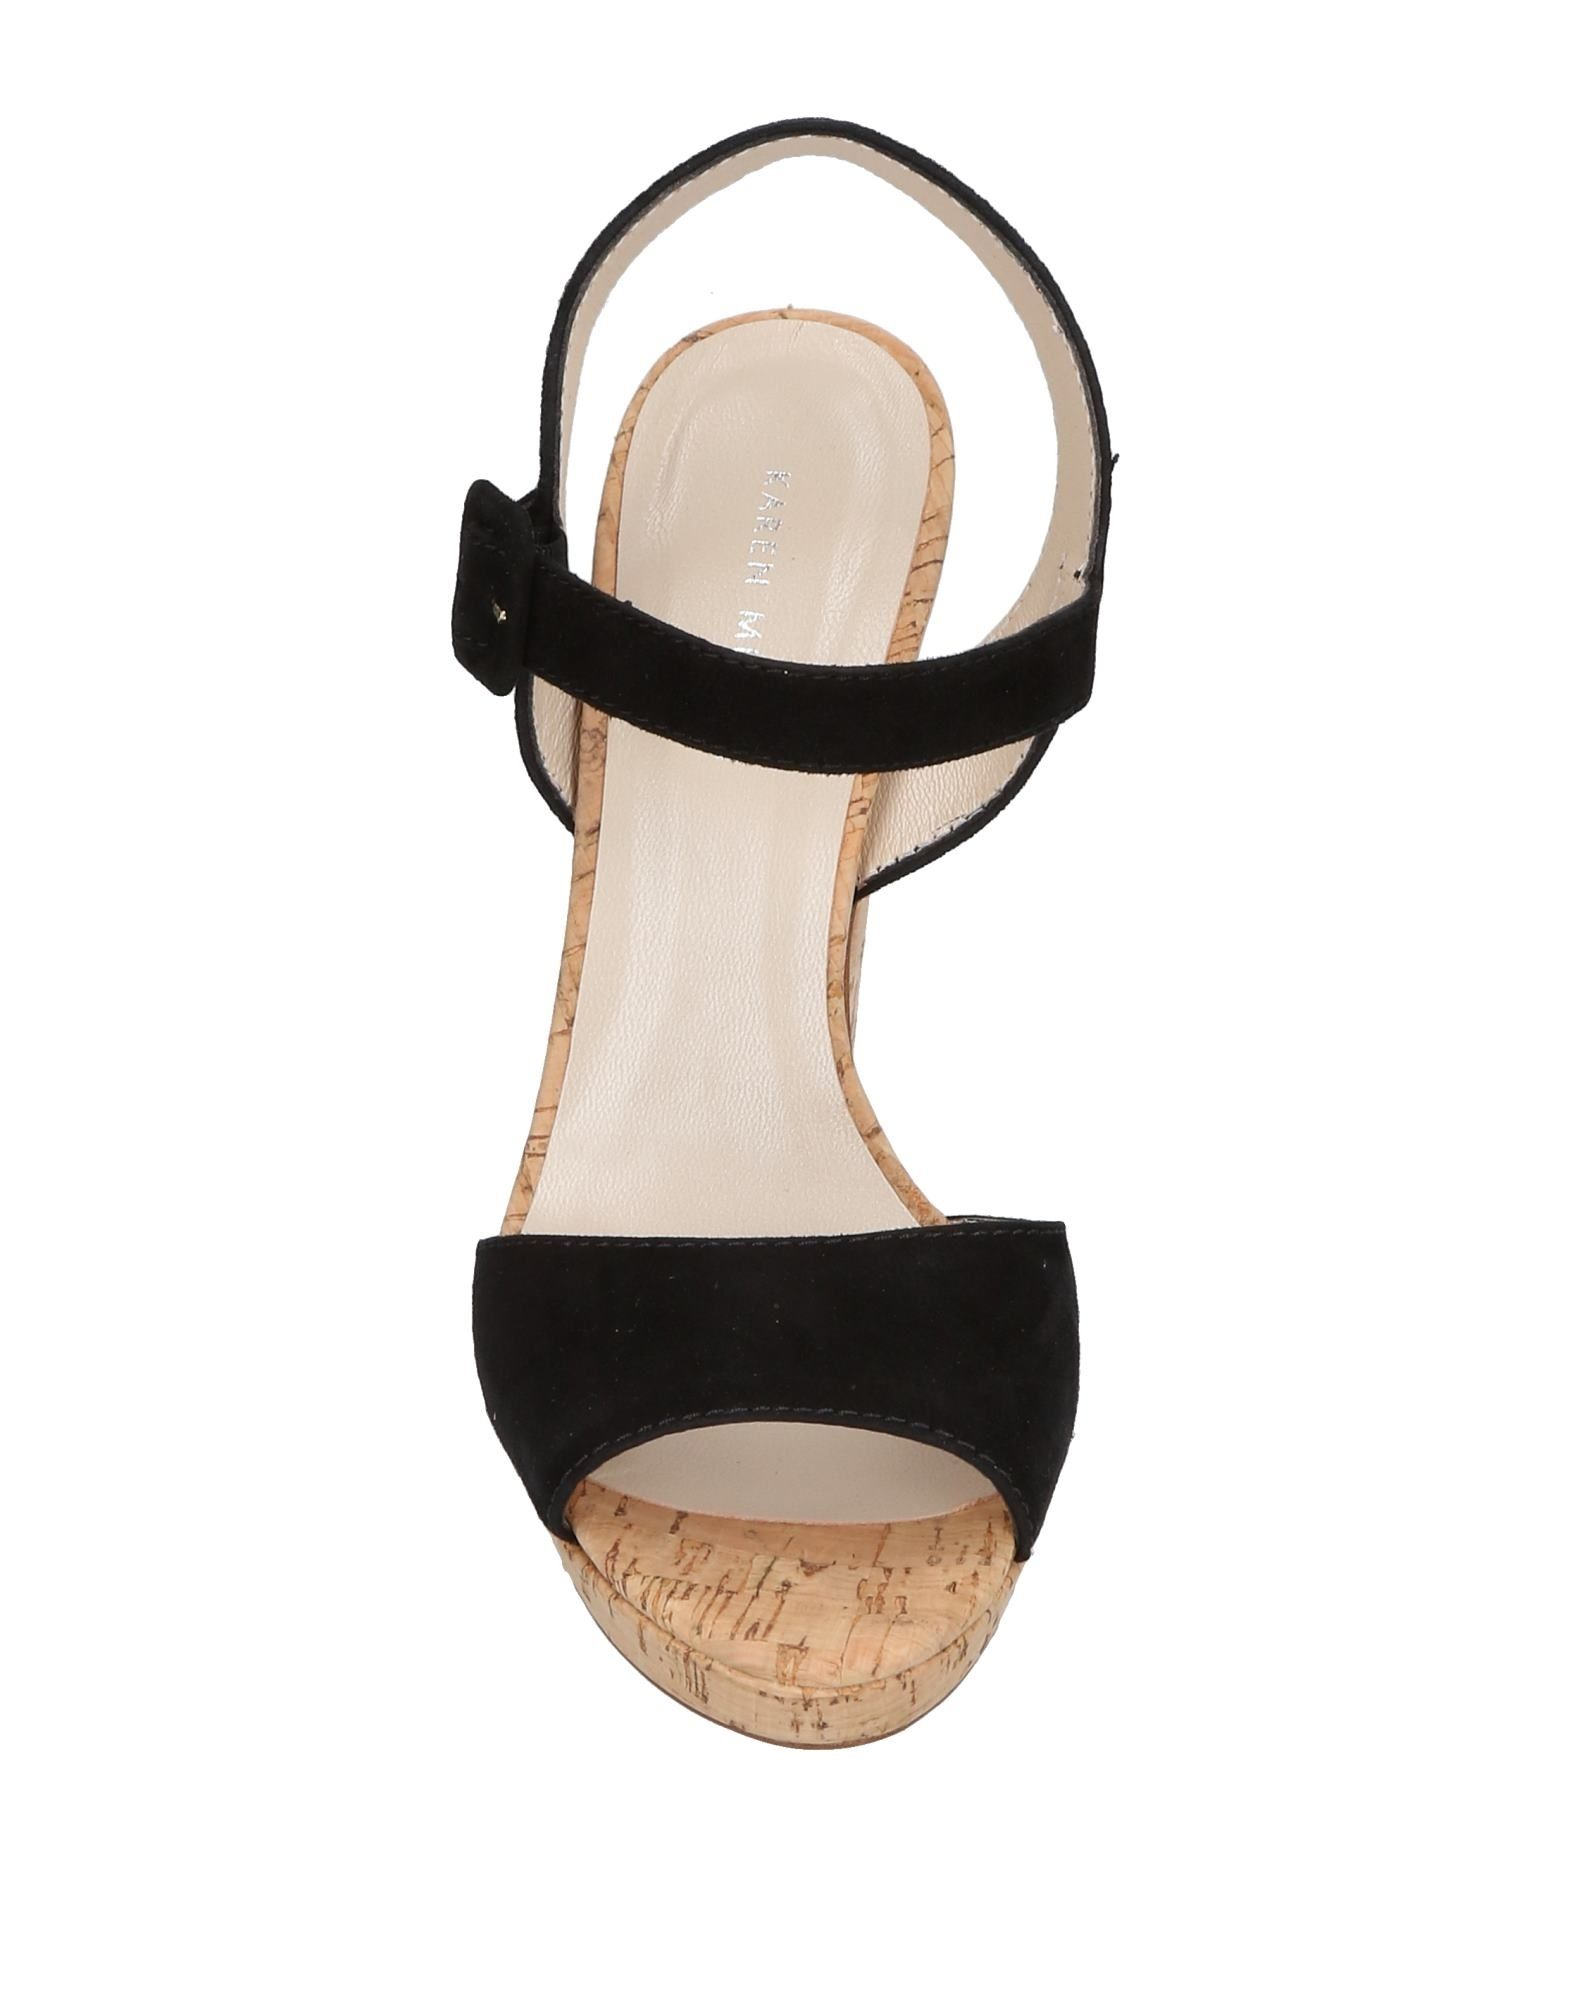 Karen Millen Sandalen Qualität Damen  11439736HL Gute Qualität Sandalen beliebte Schuhe 4460ad